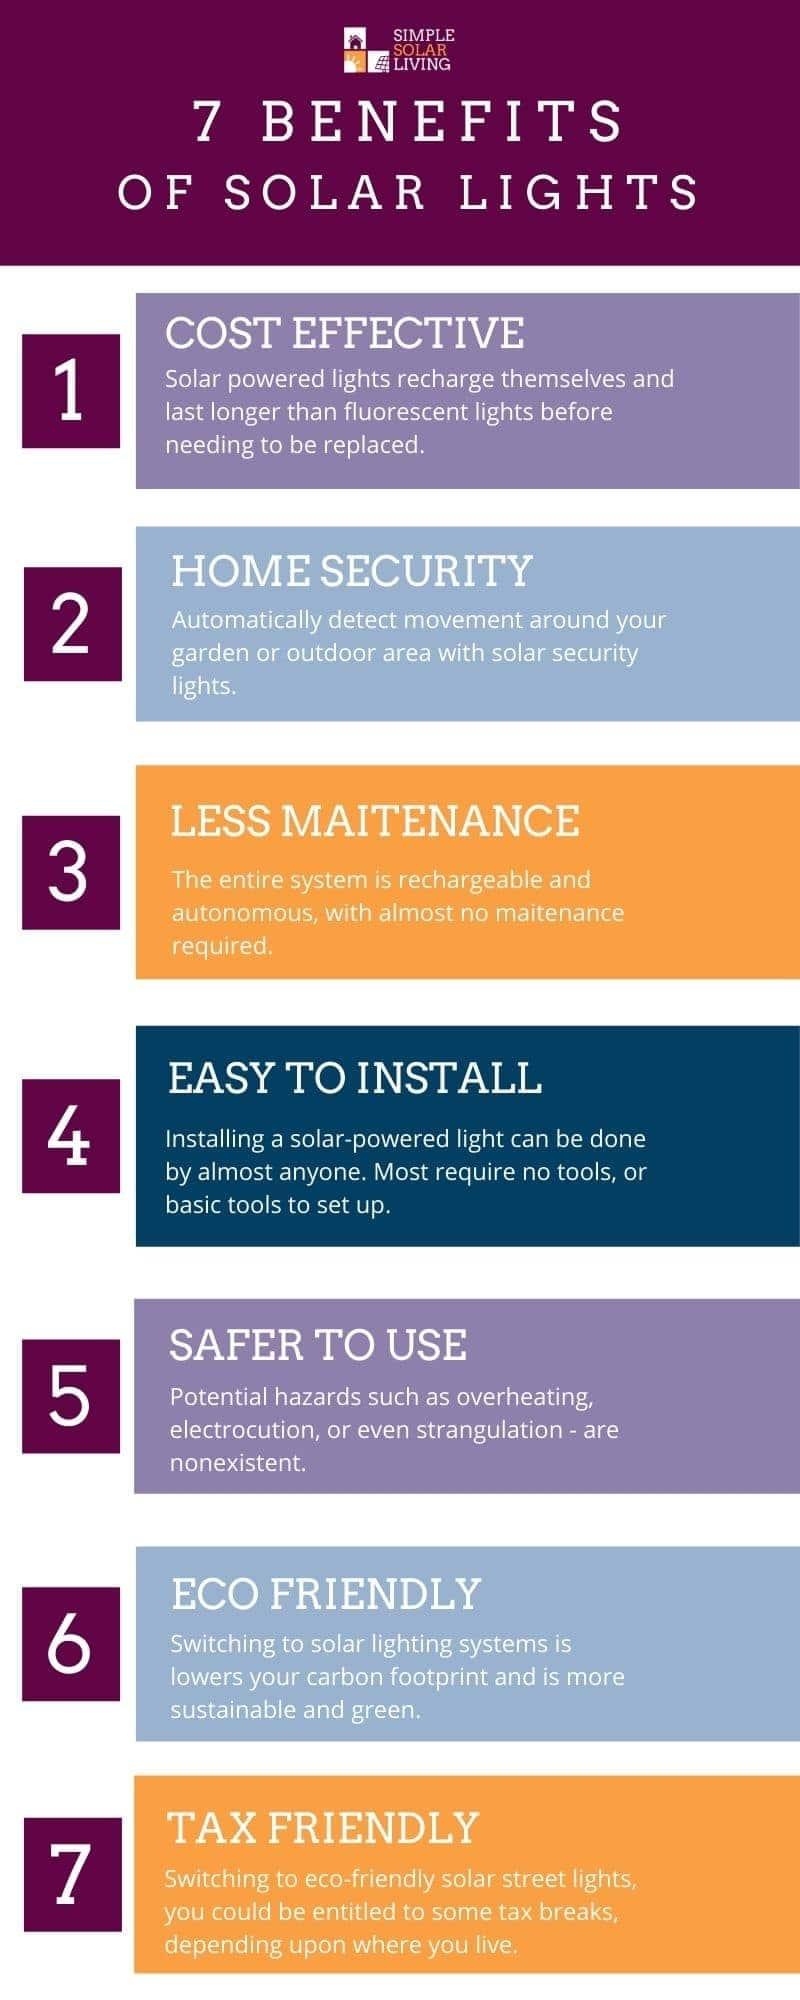 Benefits of Solar Lights Infographic